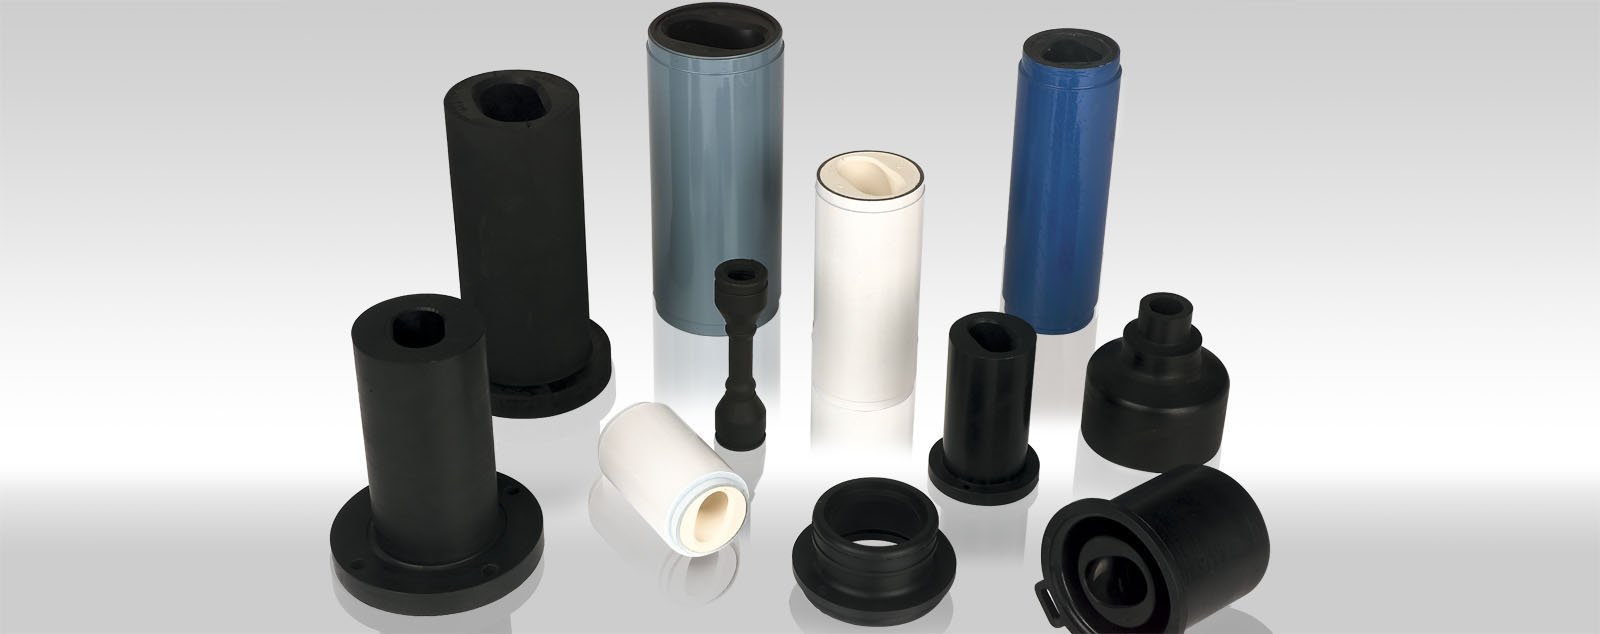 Stators for Progressive Cavity Pumps - Stators for Ecentric Screw Pumps